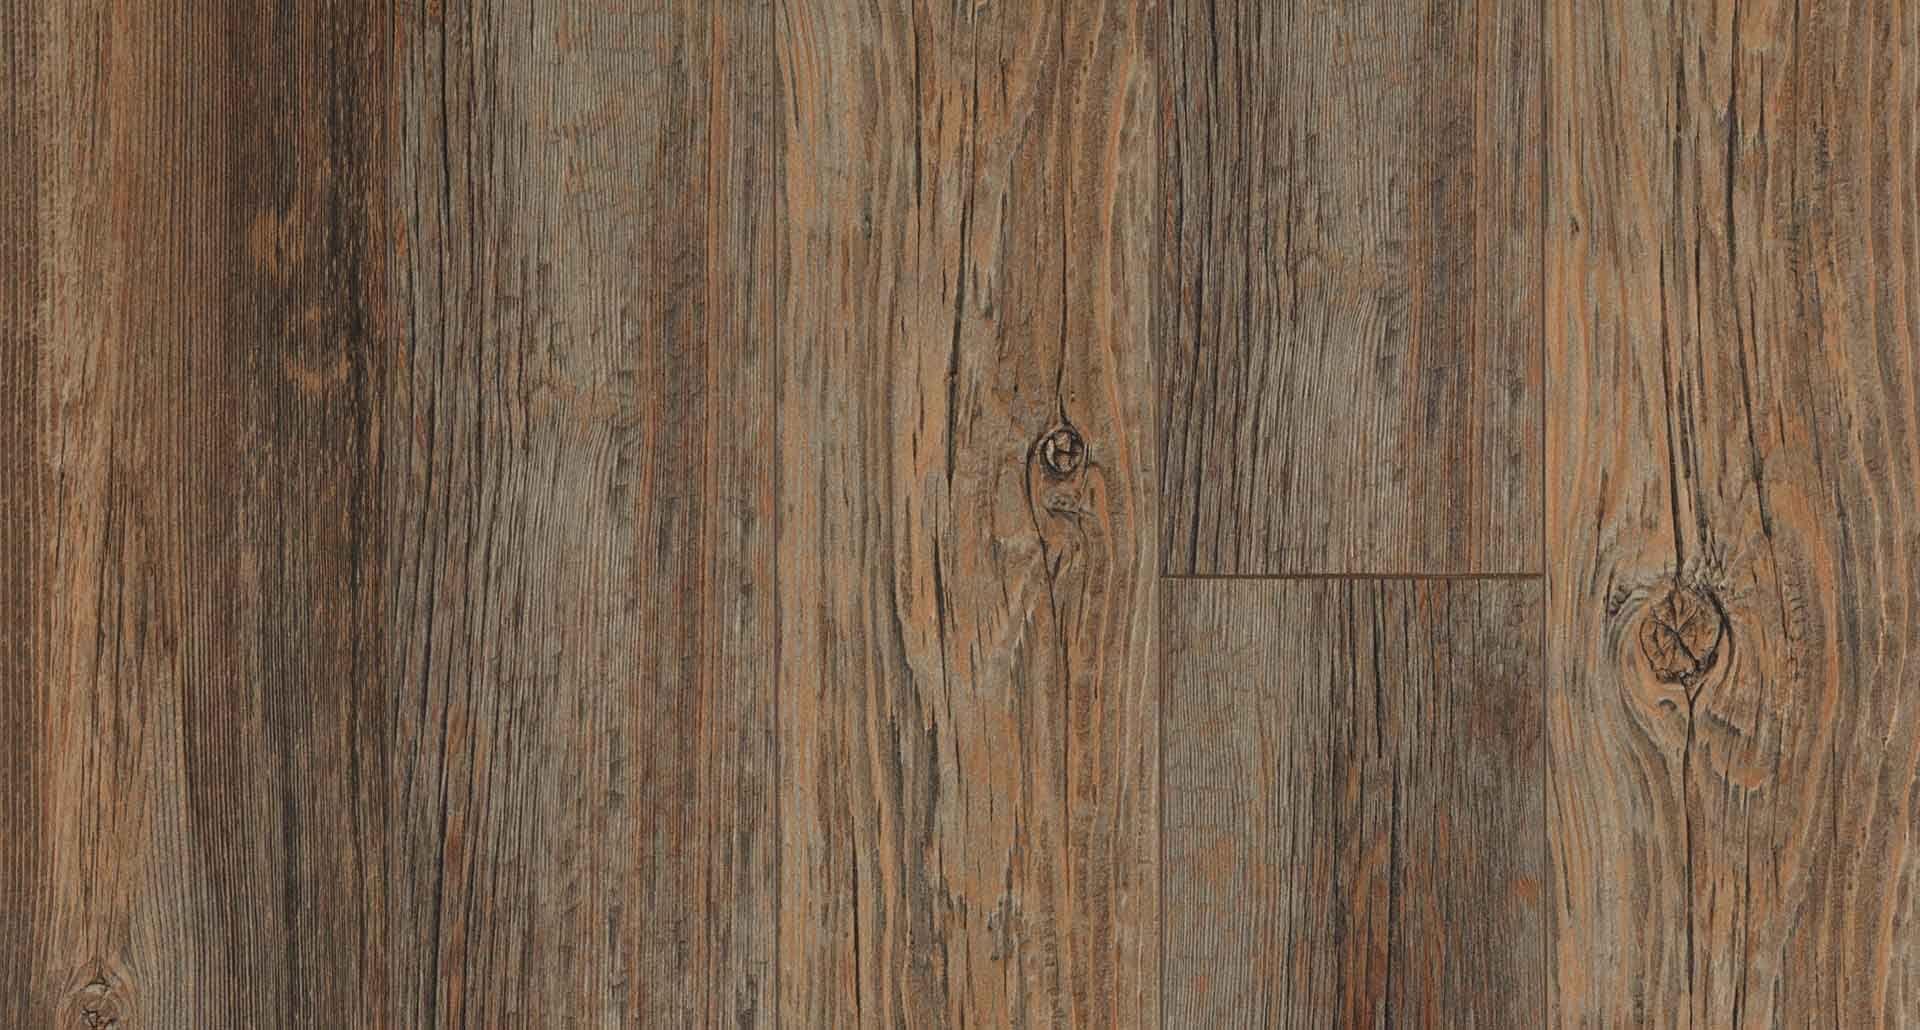 Weatherdale Pine Textured Laminate Floor Dark Pine Wood Finish 10mm 1 Strip Plank Laminate Flooring Easy To Laminate Flooring Oak Laminate Flooring Flooring